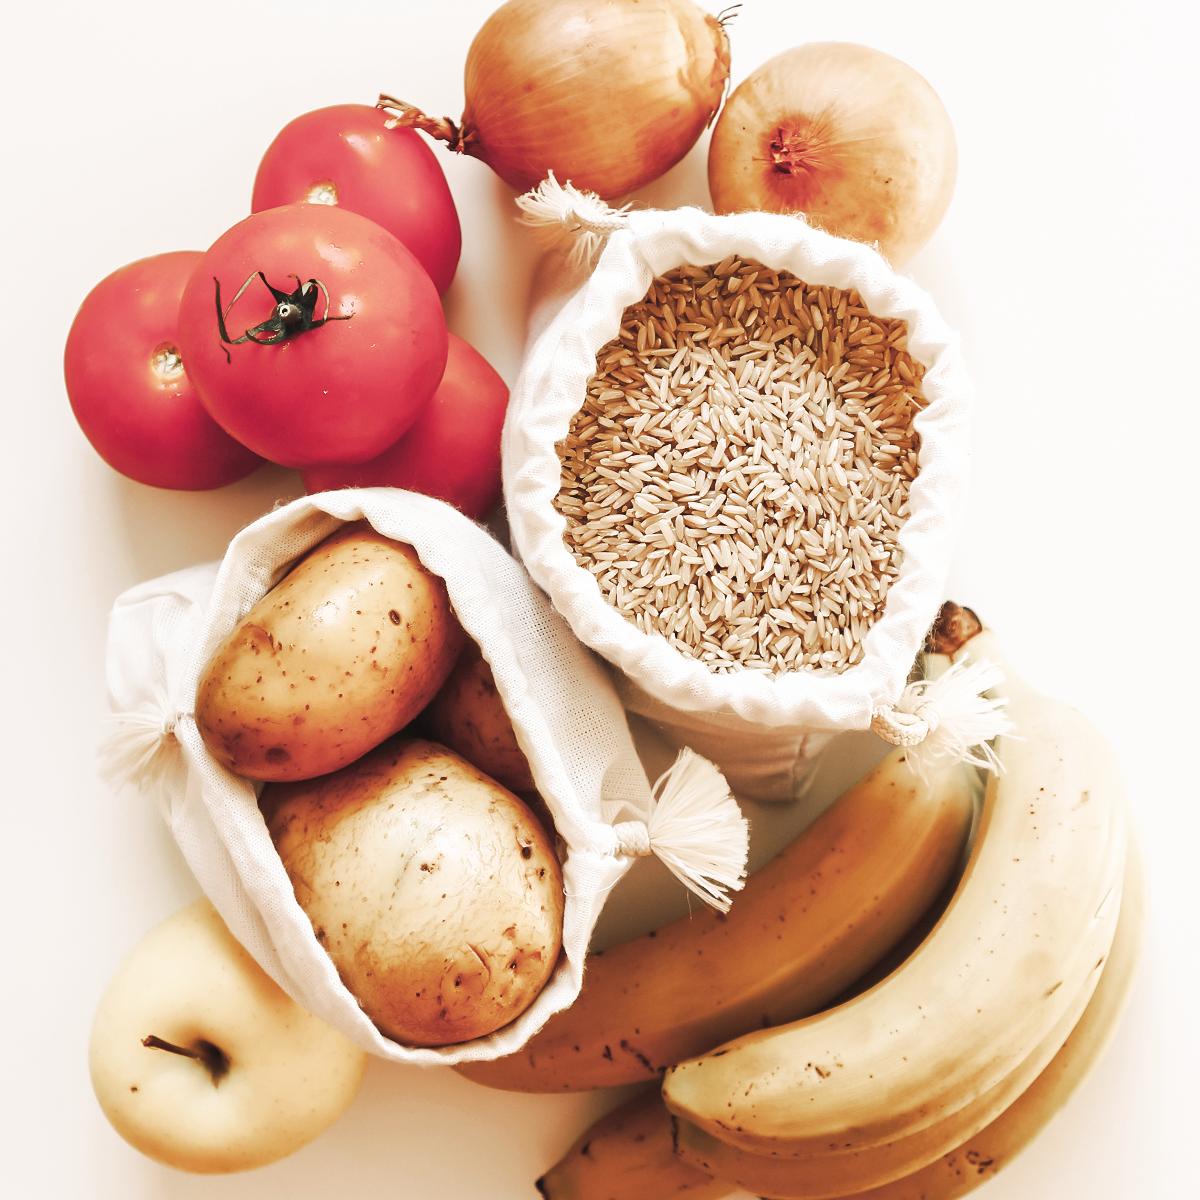 Bananas, onion, potatoes, rice, tomatoes, apple.